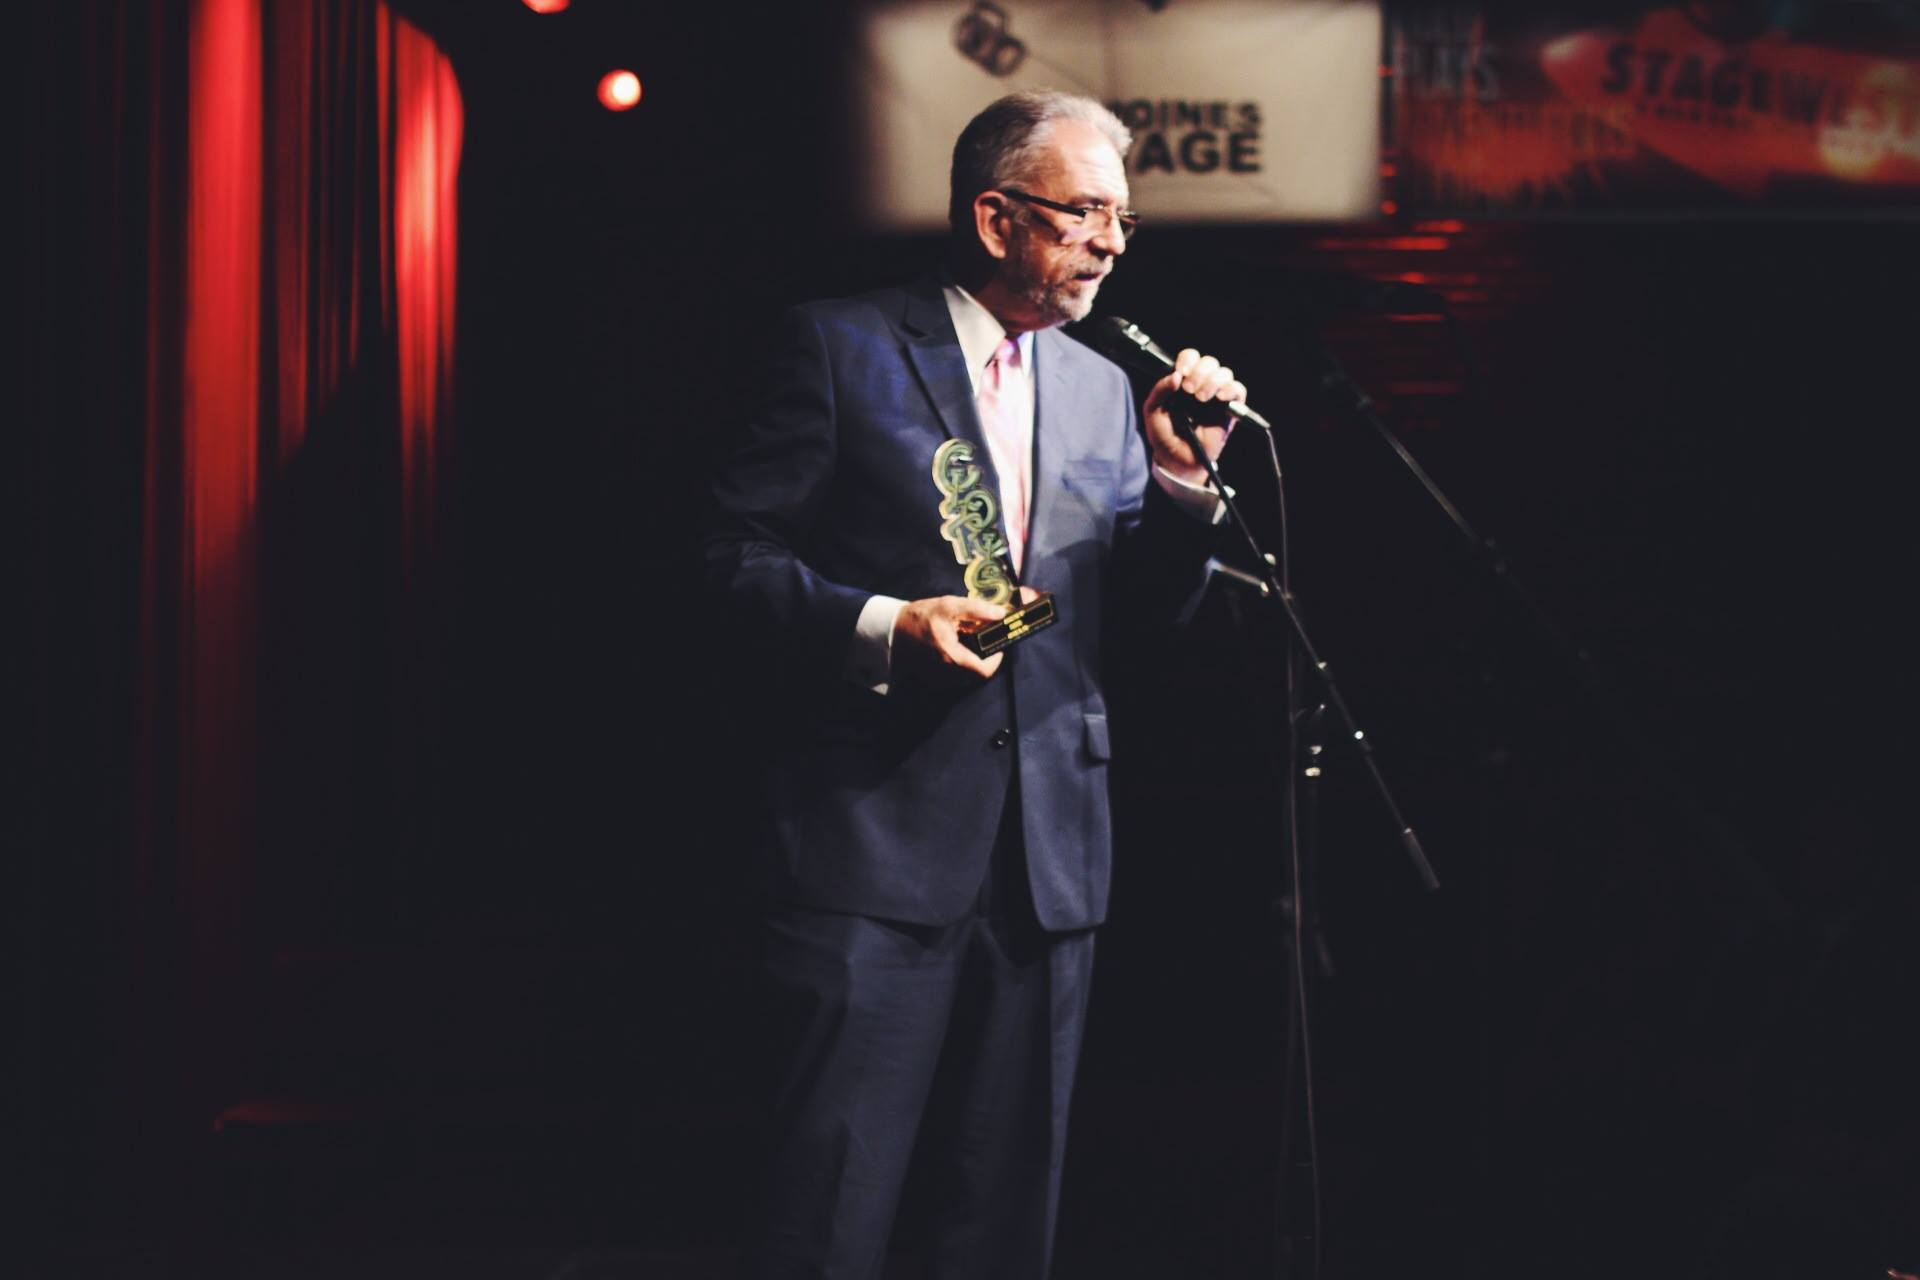 Farmboy Cloris Awards Statue Photo 2